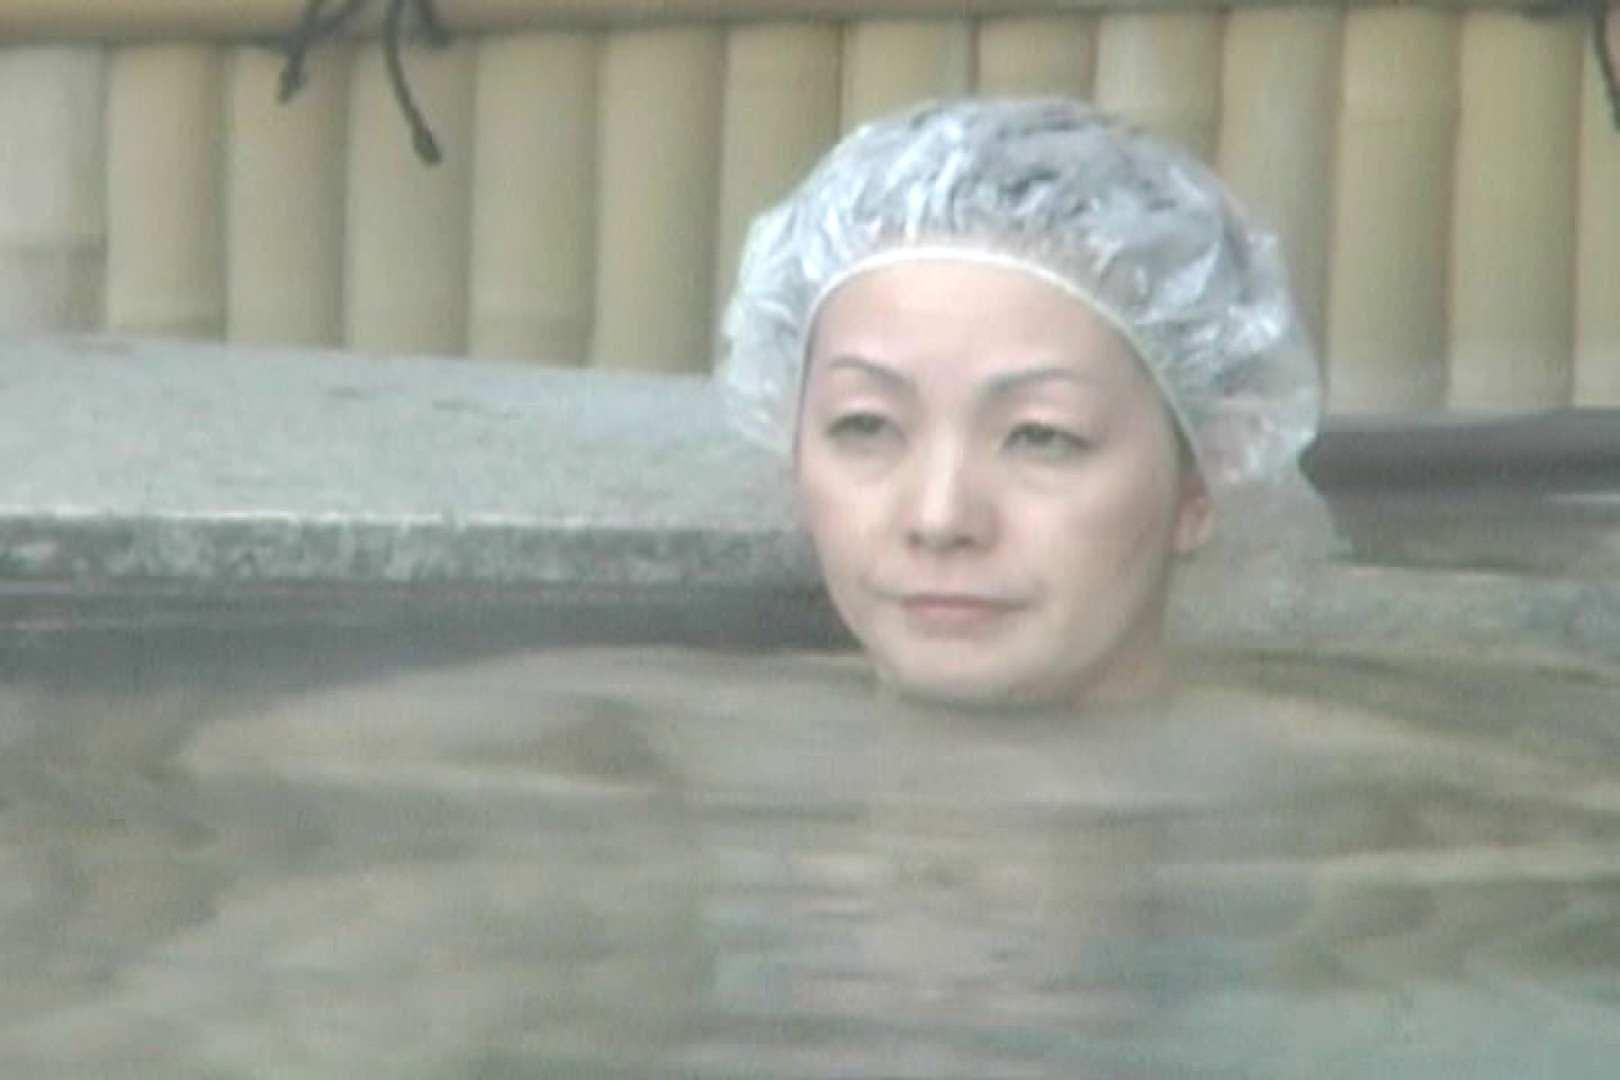 Aquaな露天風呂Vol.592 露天 | OLのプライベート  12pic 10